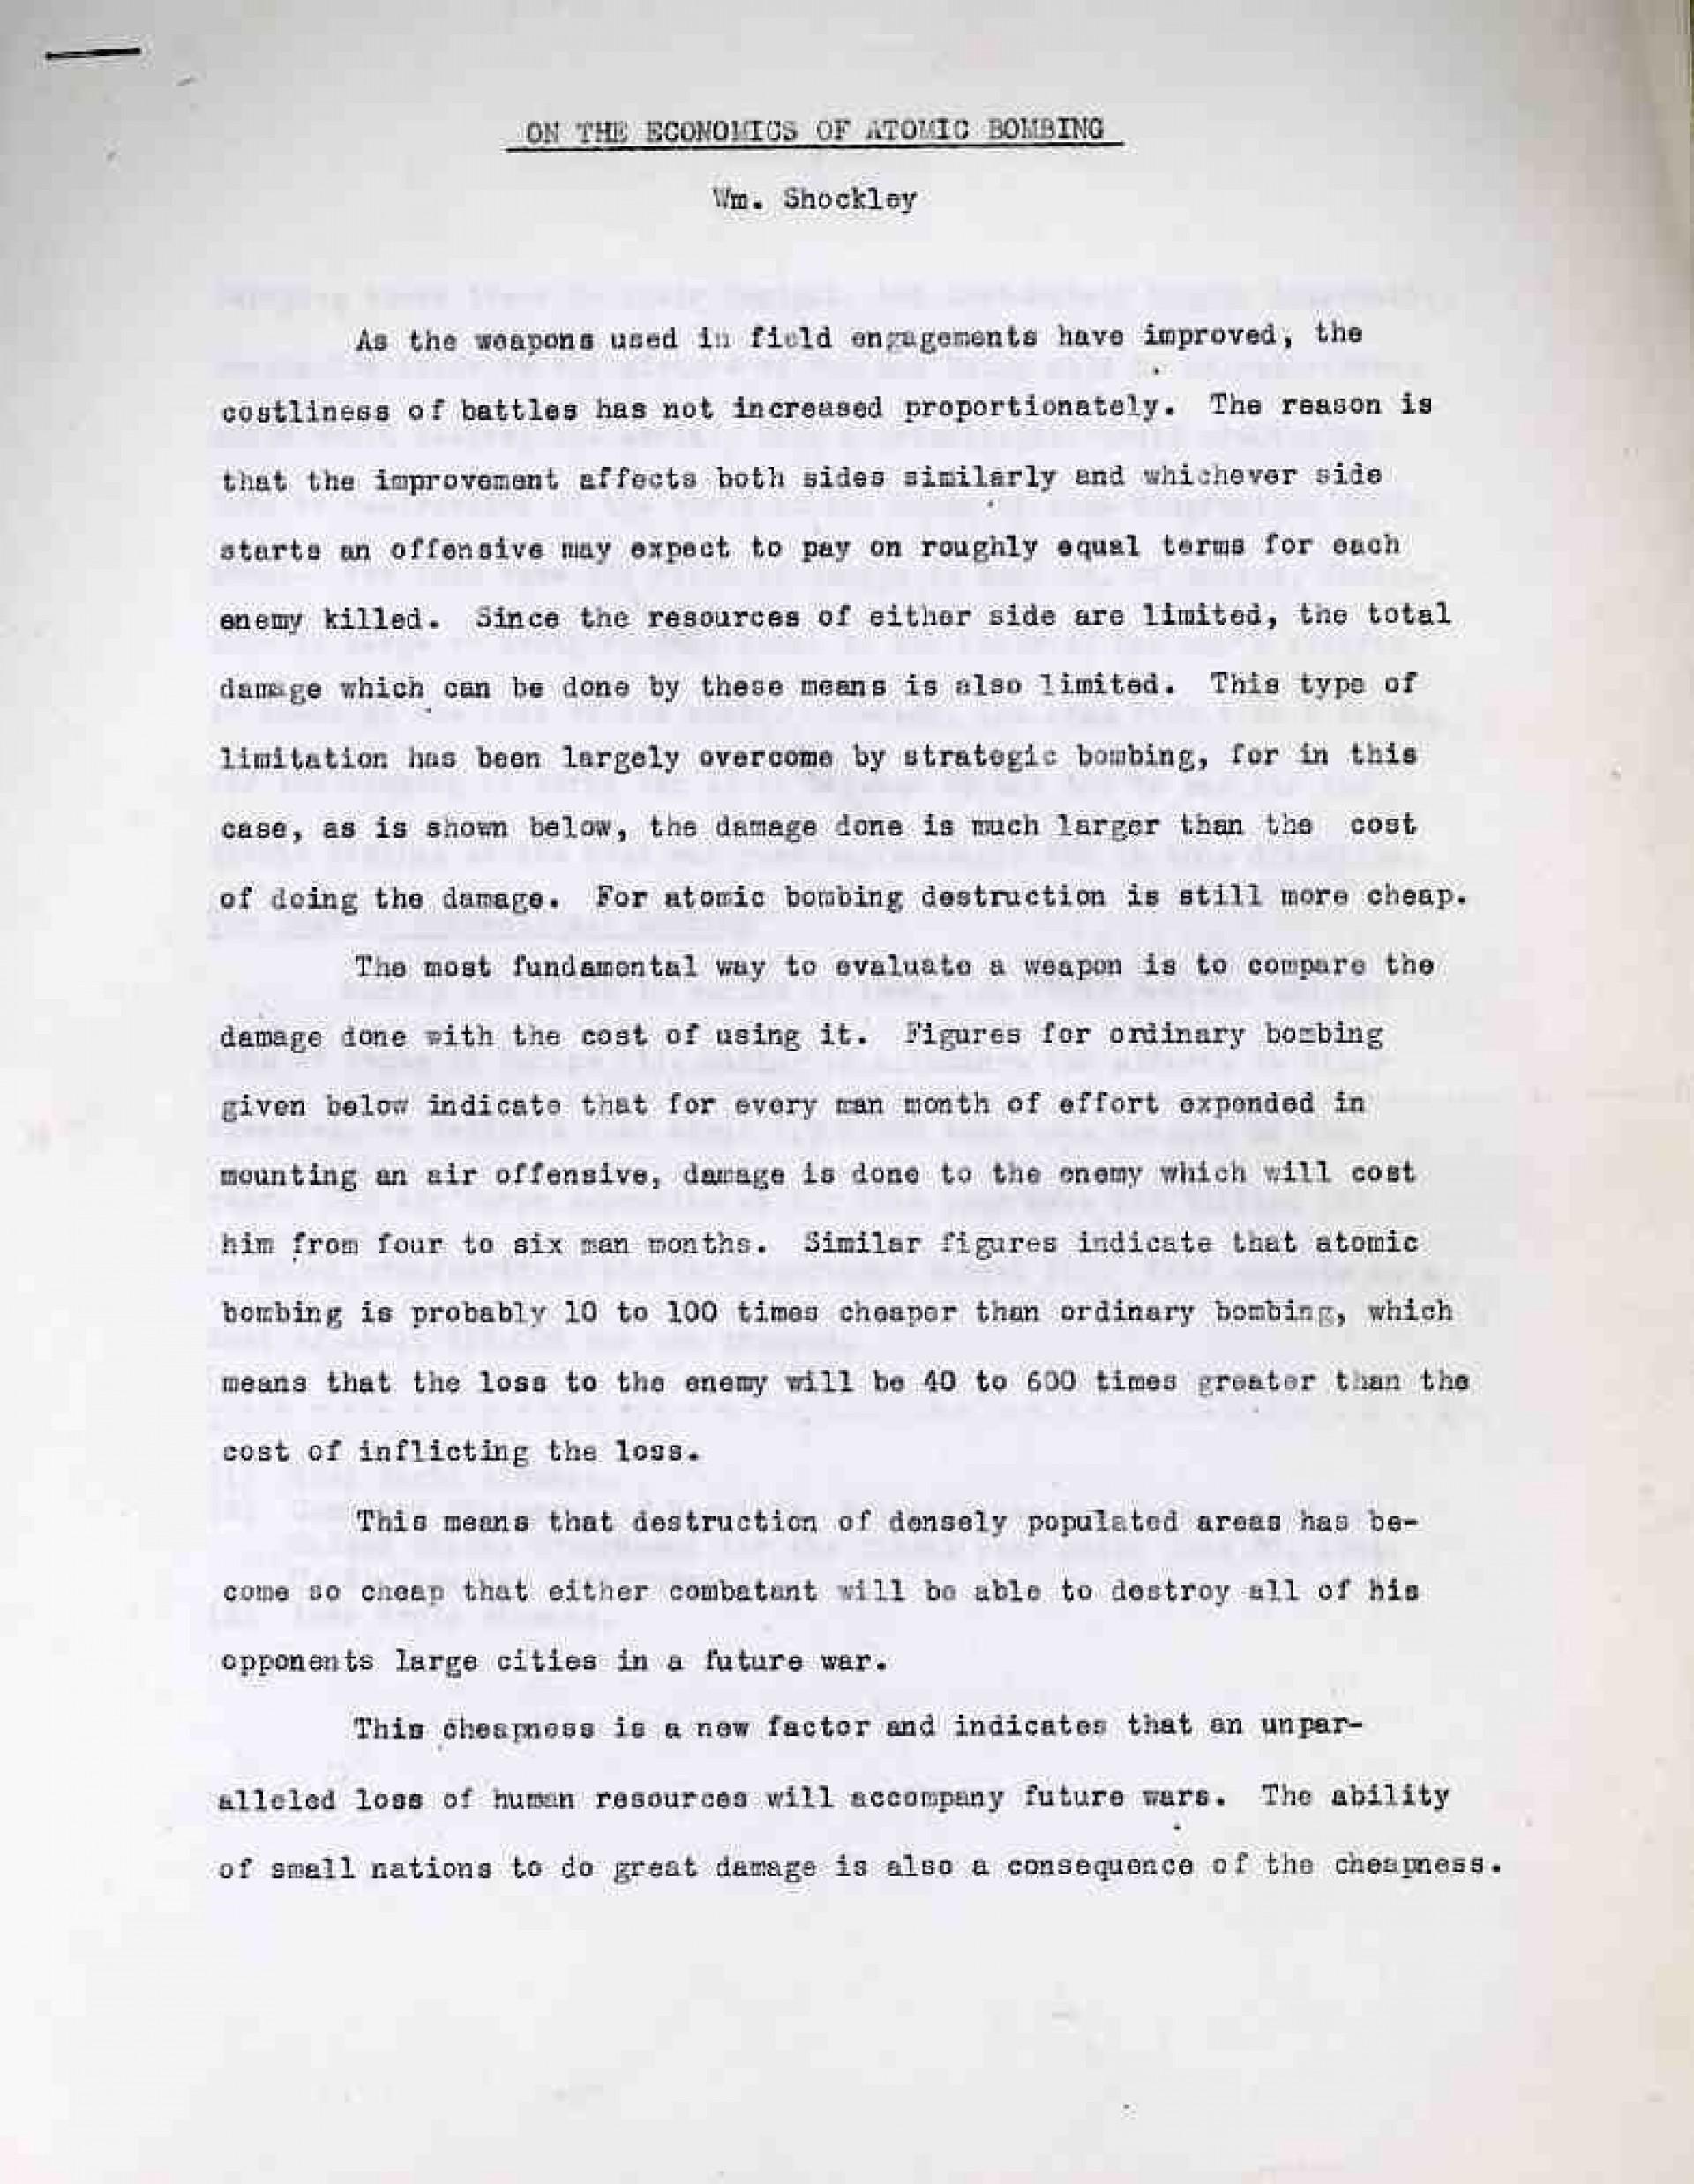 012 Atomic Bomb Essay Example Shocking Topics Questions Prompts 1920